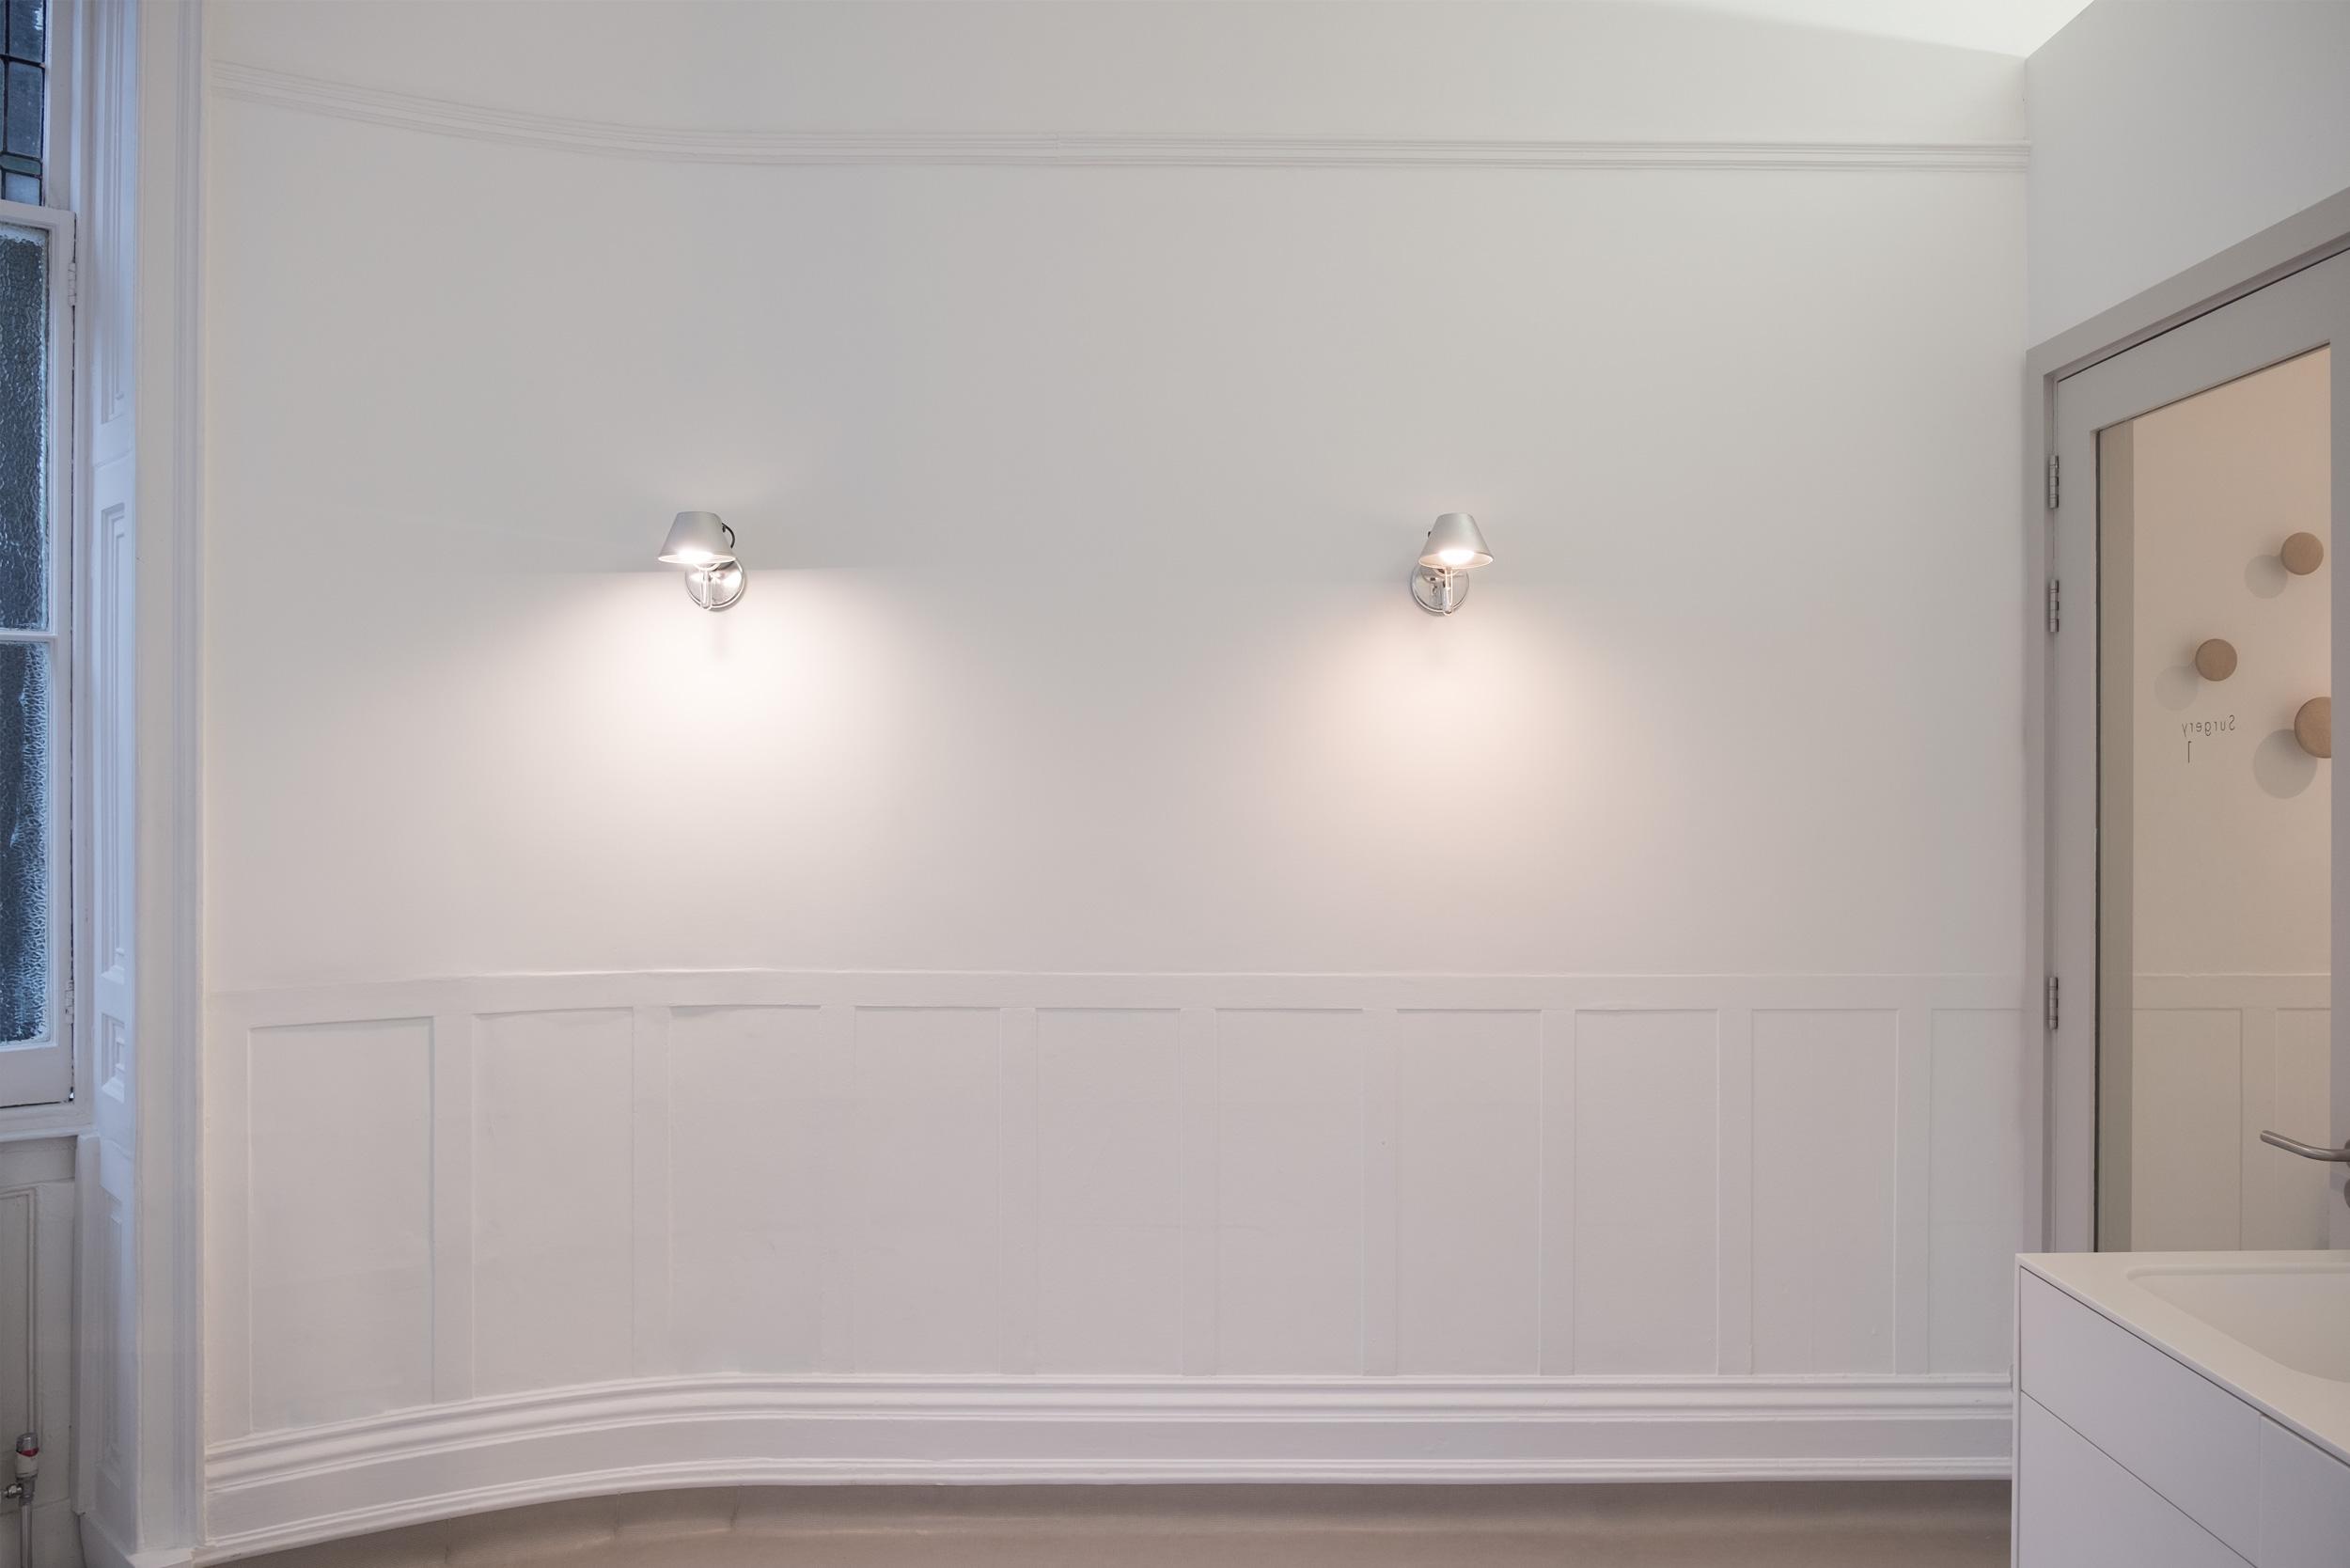 D-Clinic-Fiona-Burrage-Interiors-Norwich-Photography-Lights.jpg